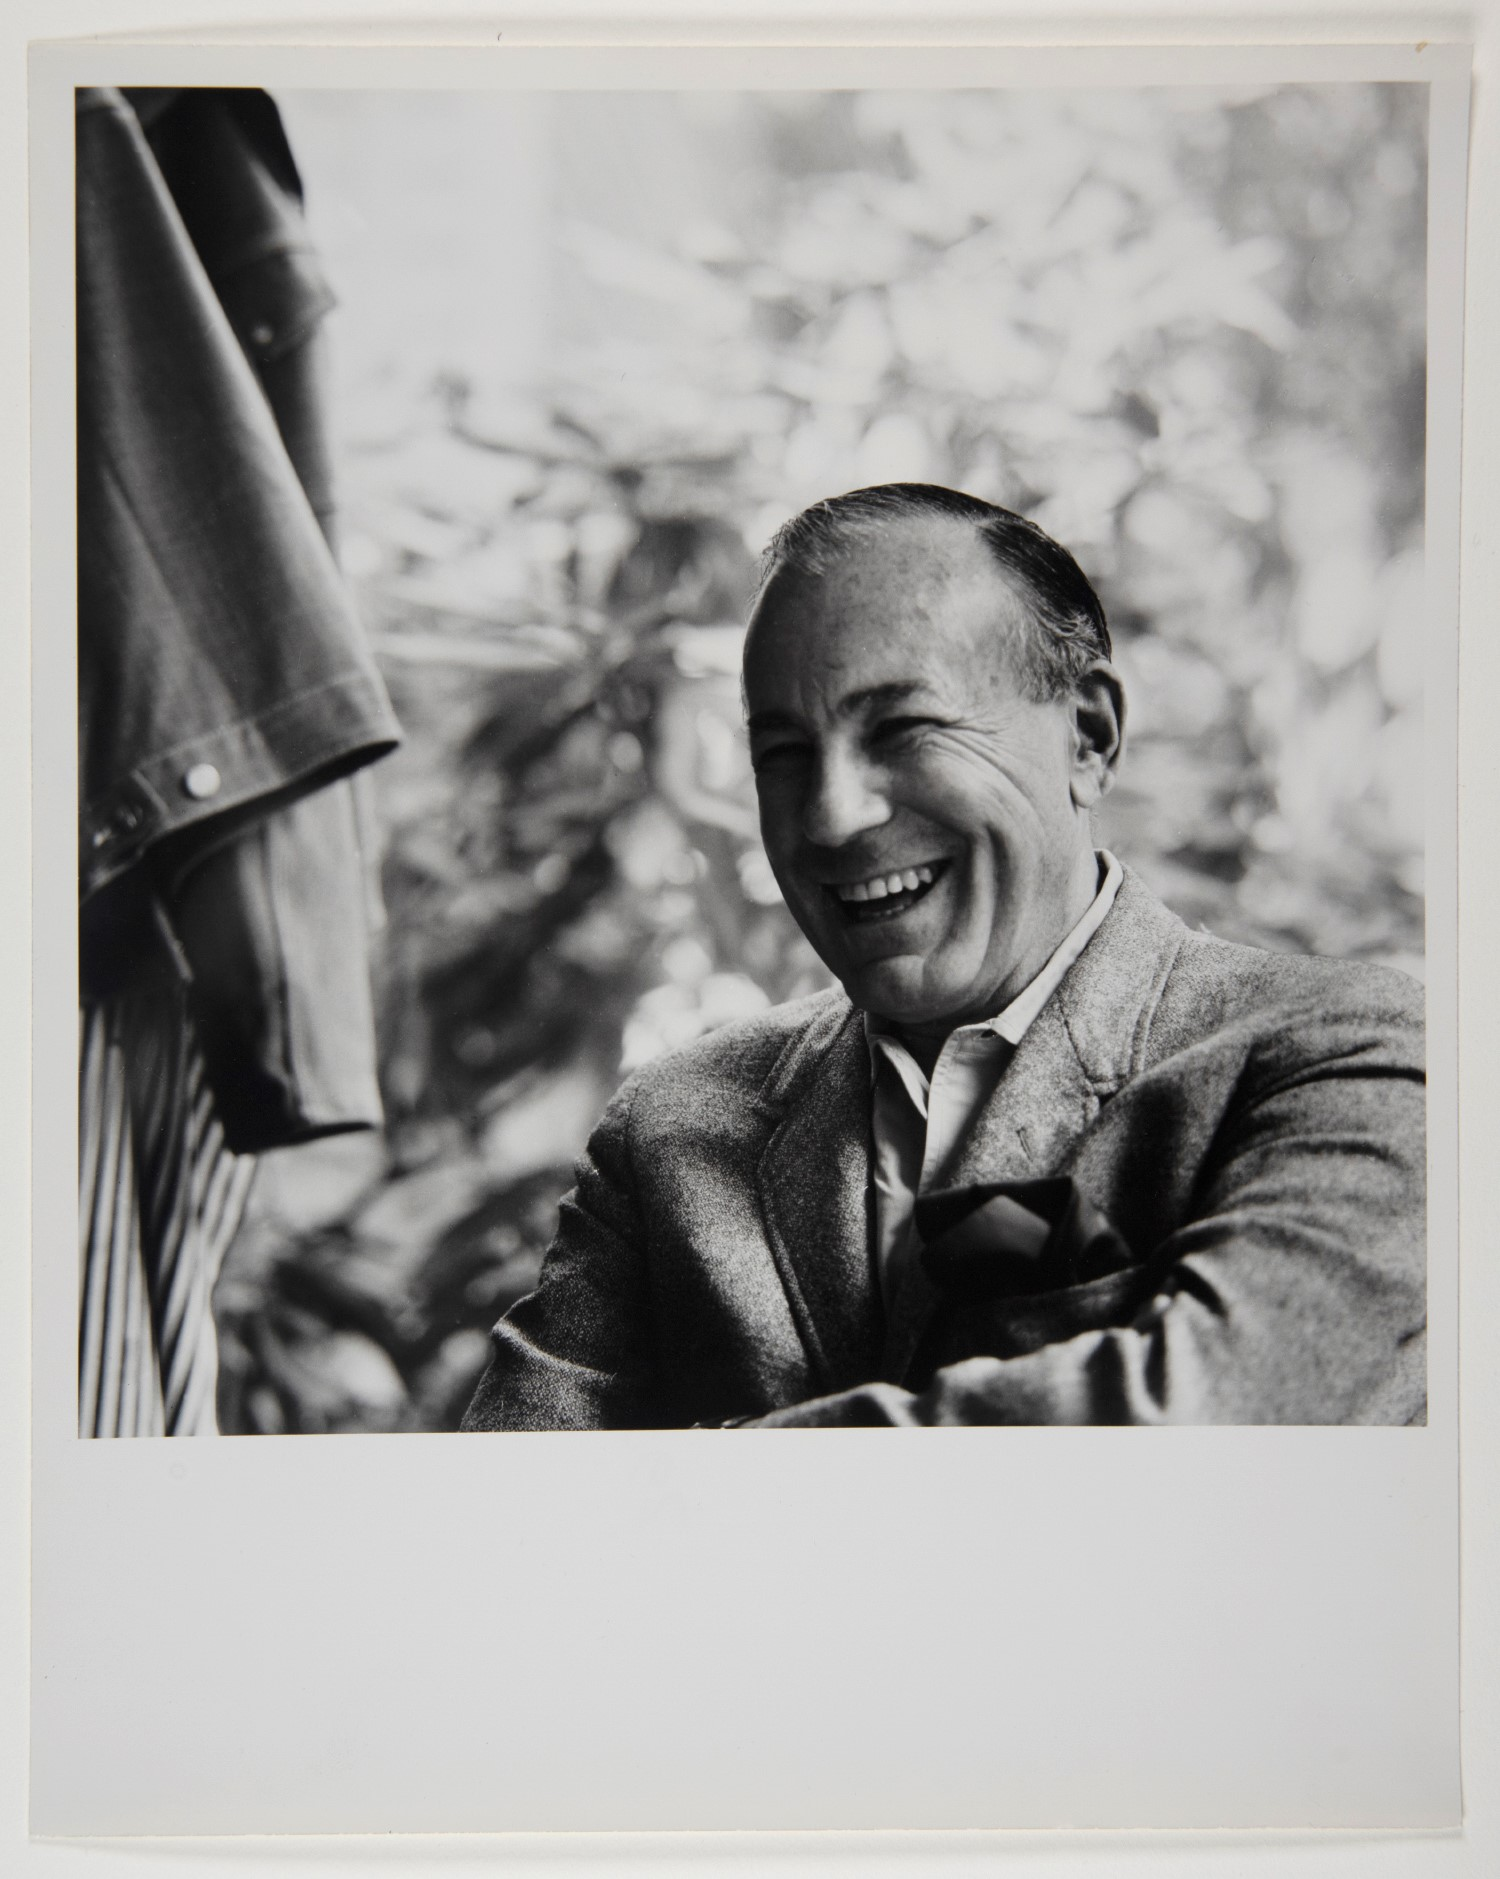 Lester Beall's Library /  Hirsch